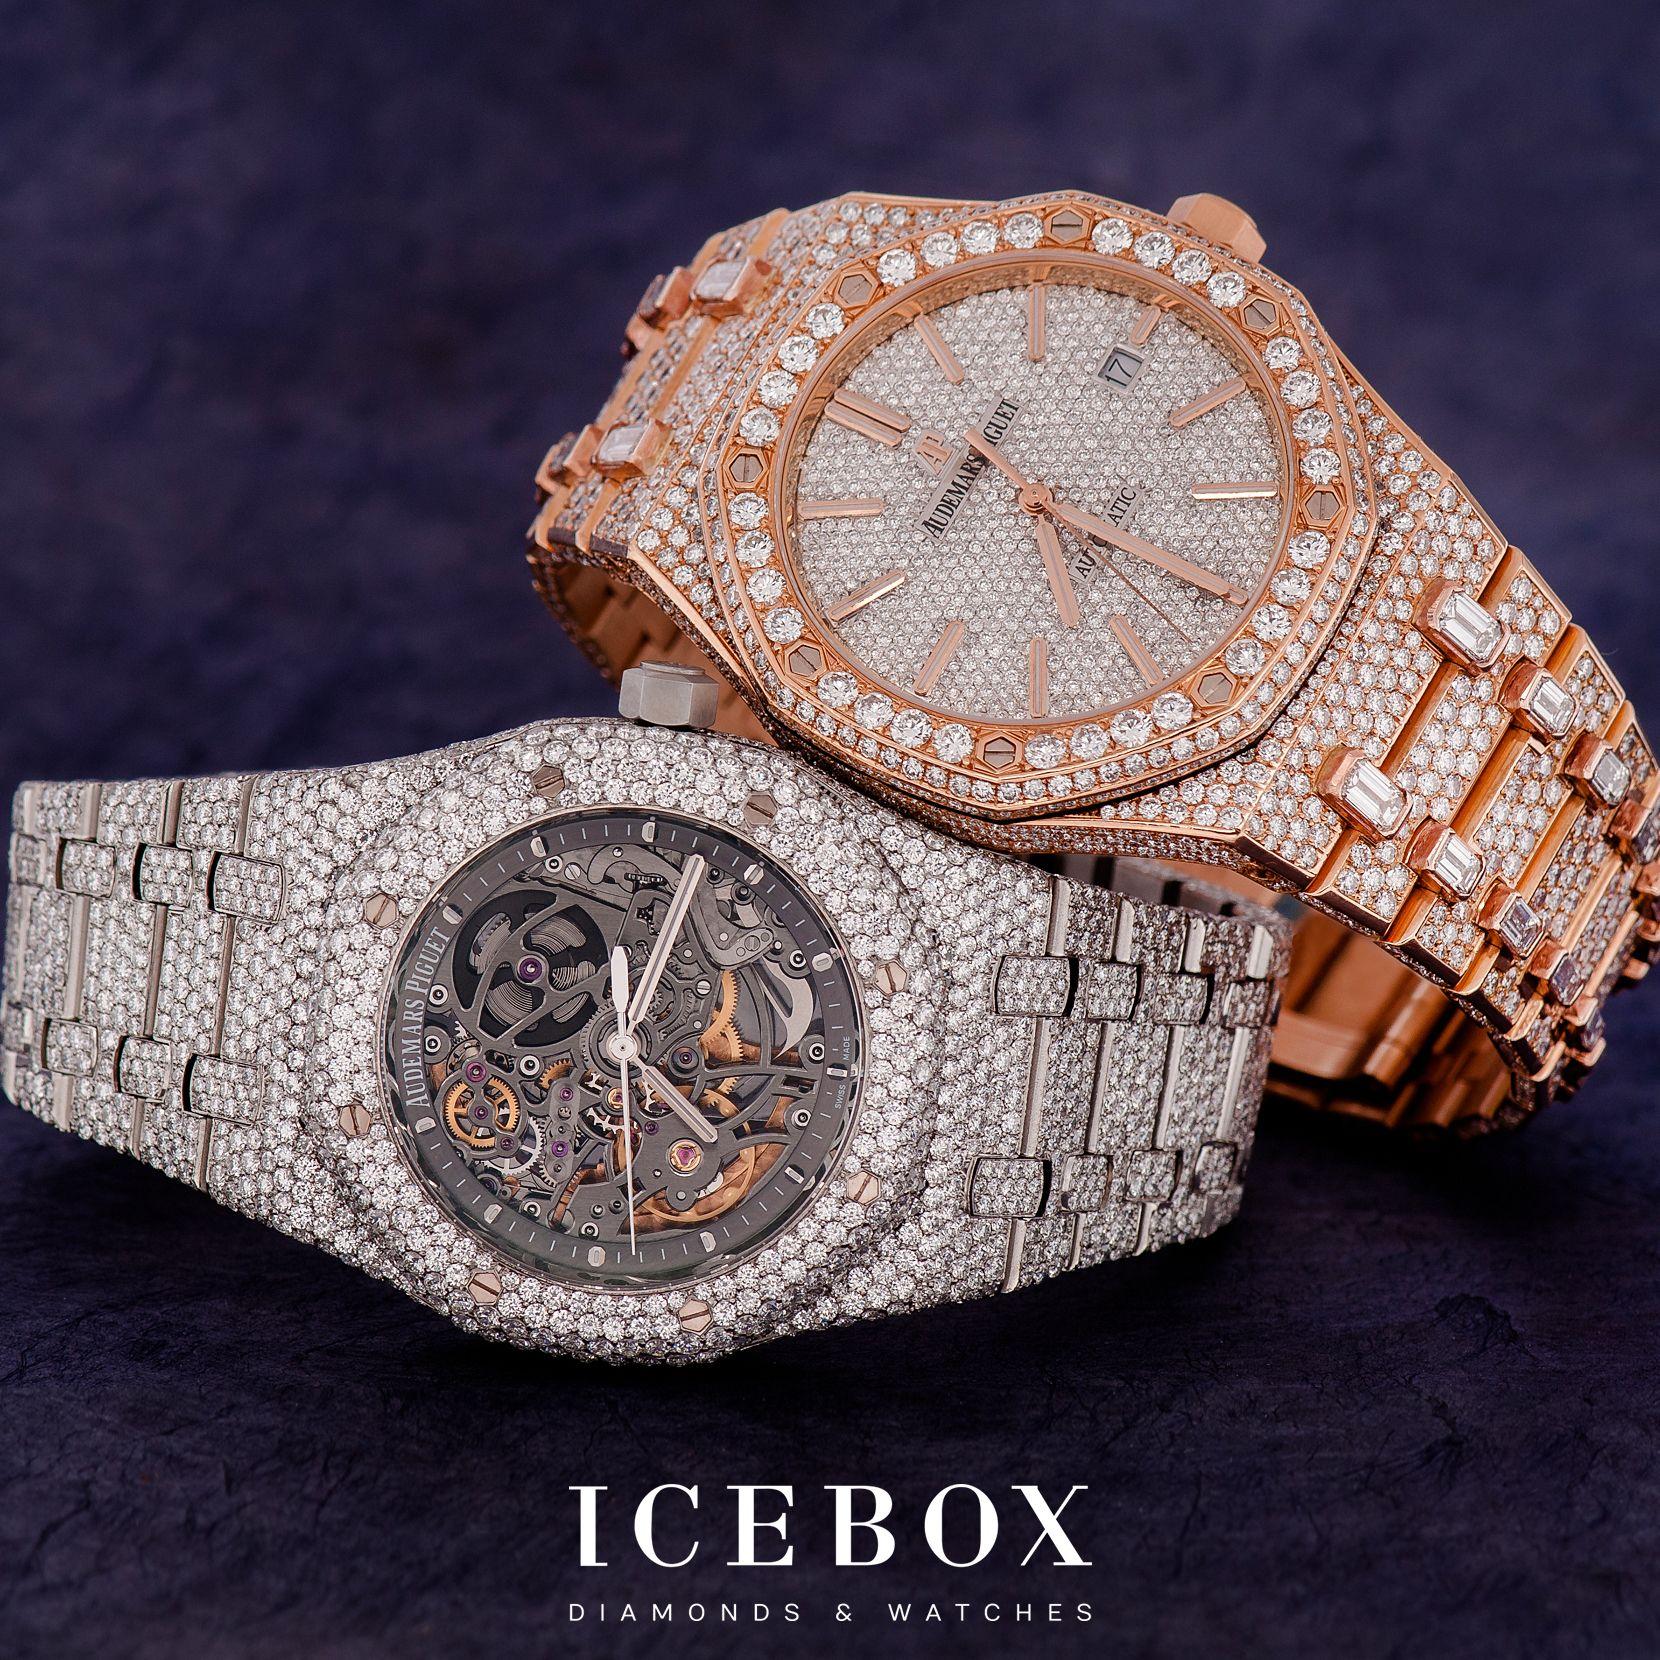 Pin by Icebox Diamonds & Watches on Audemars Piguet ...